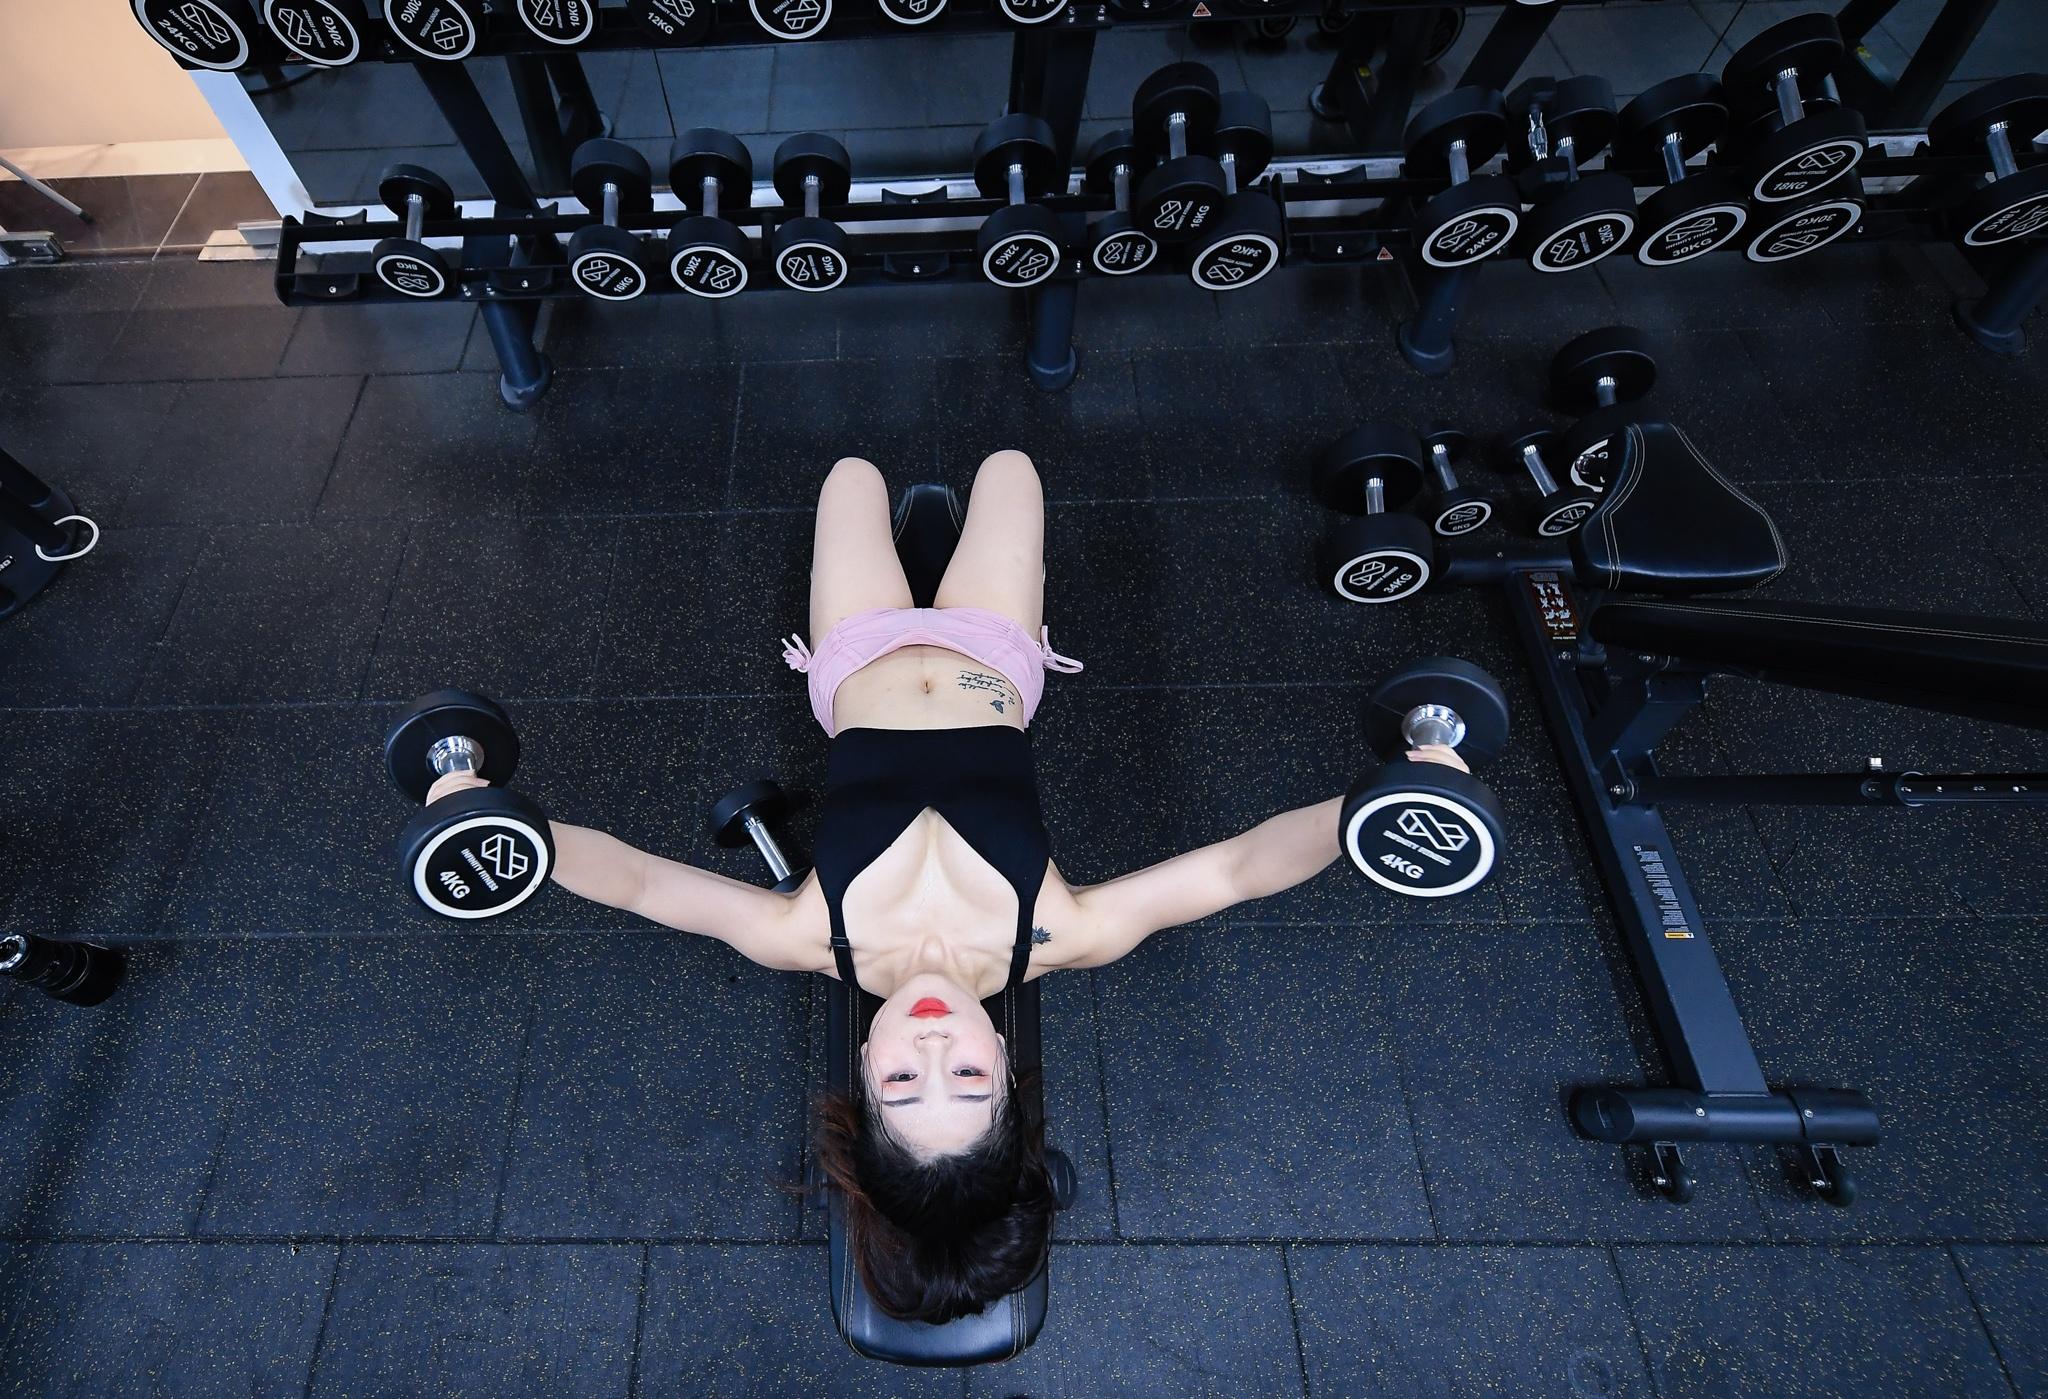 Hot girl mua con so khong ai yeu vi qua manh me hinh anh 18 17_anh_to_hot_girl_mua_con_zing40.jpg